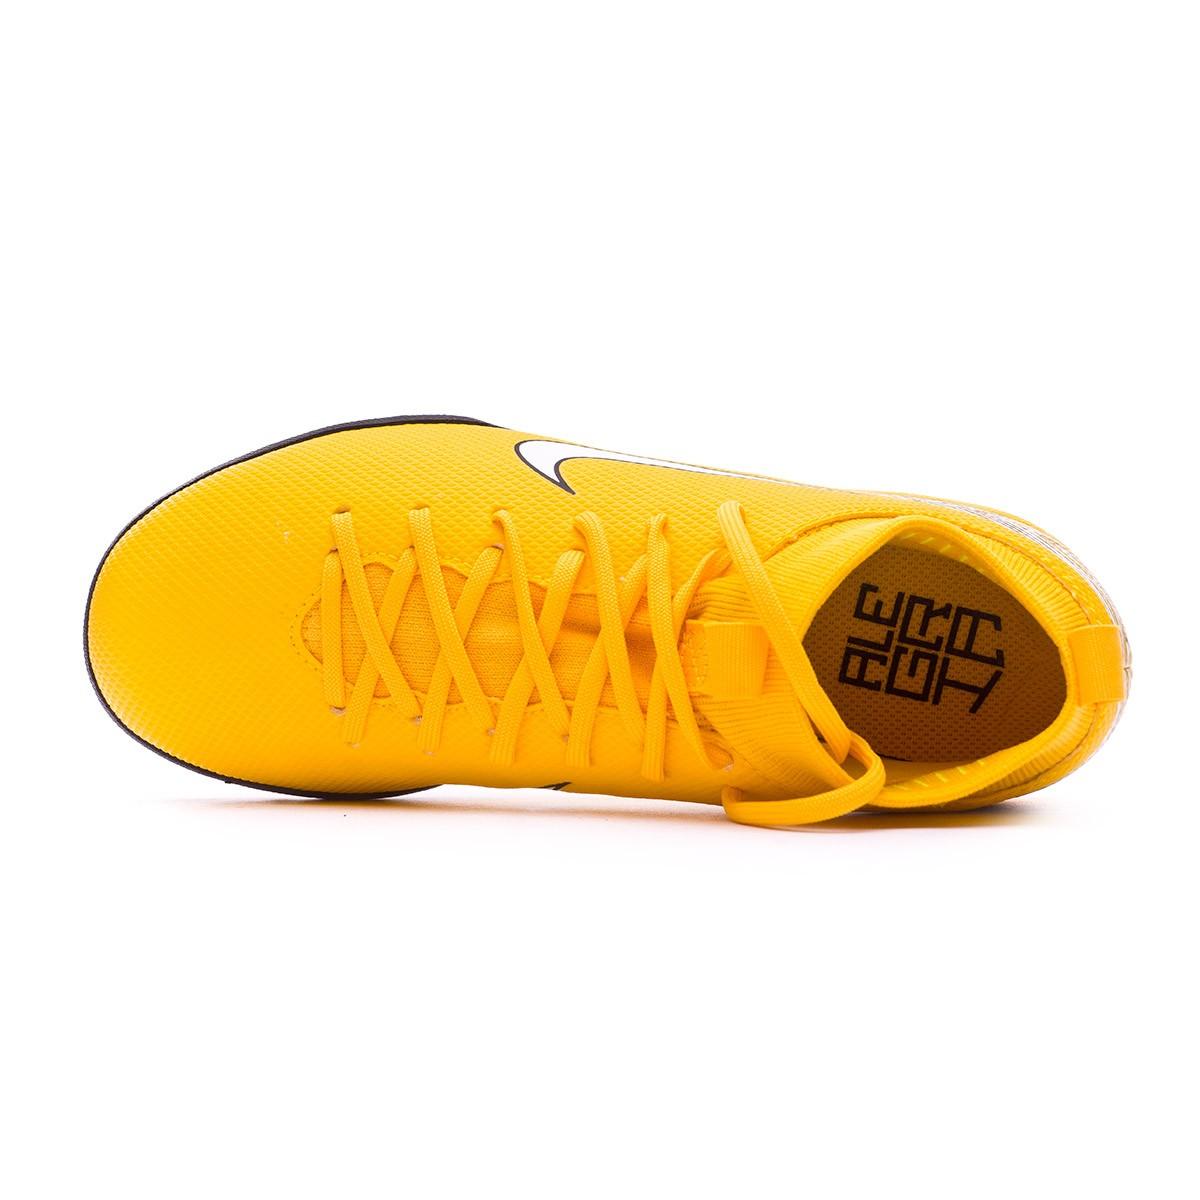 Football Boot Nike Kids Mercurial SuperflyX VI Academy Turf Neymar Yellow- Black - Leaked soccer 7f5423facc2c2